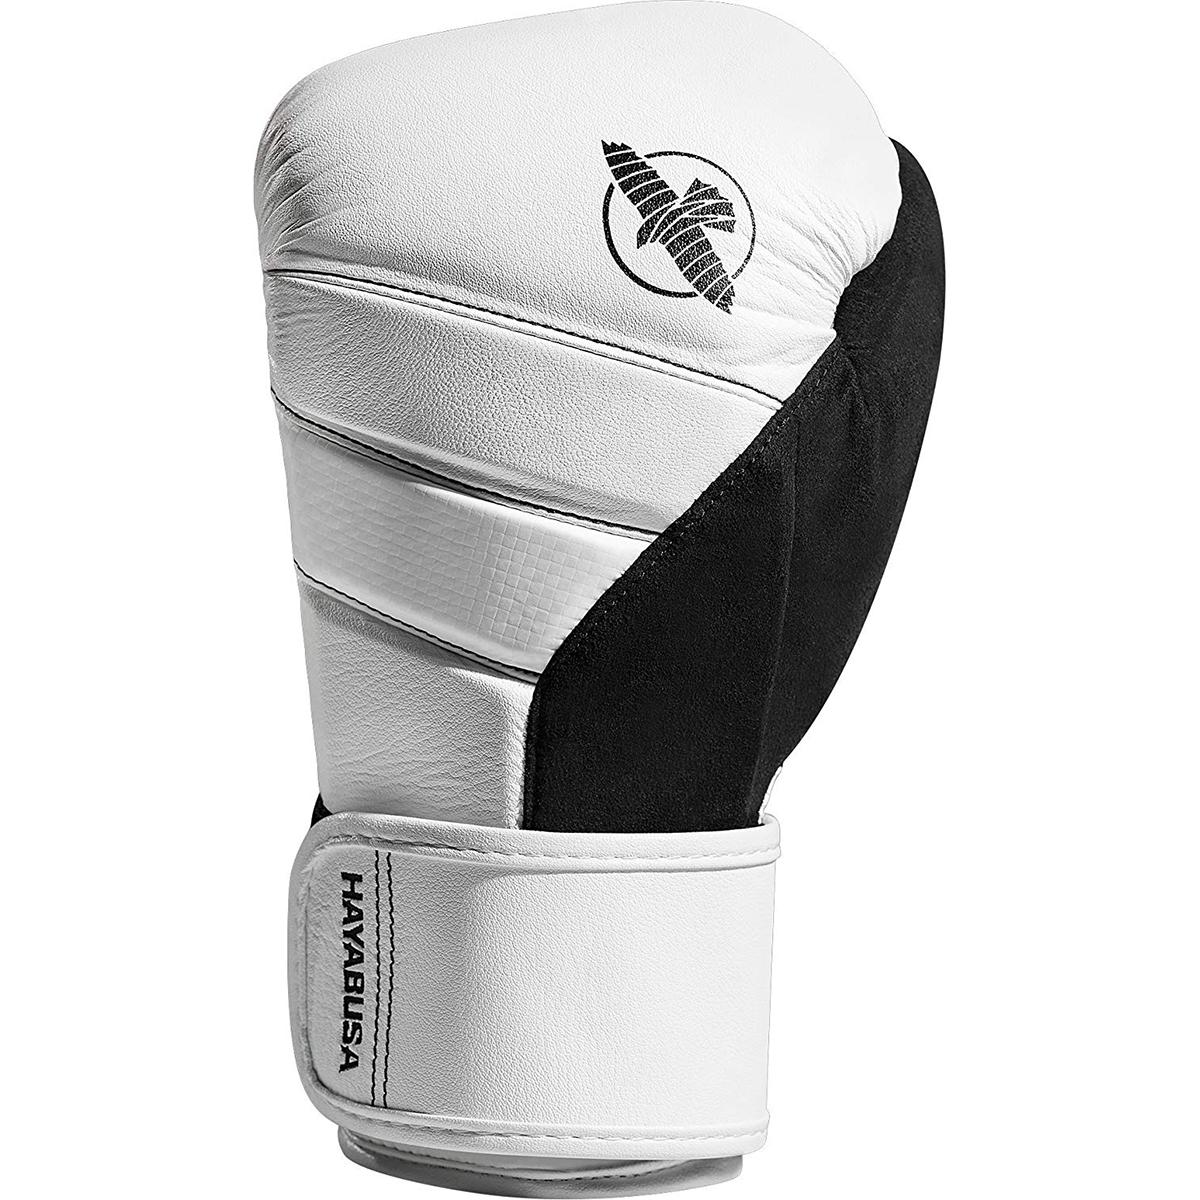 Hayabusa-T3-Dual-X-Hook-and-Loop-Closure-Vylar-Leather-Training-Boxing-Gloves thumbnail 23